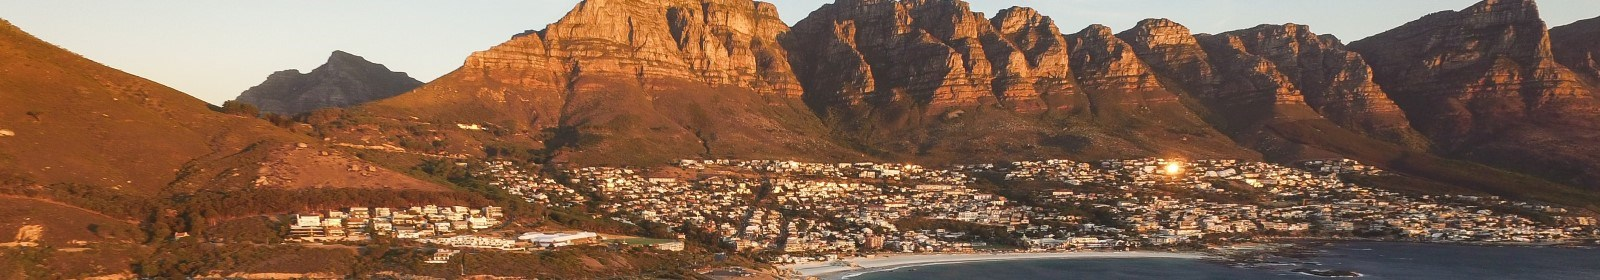 SA's top ten suburbs command an average house price of R12 million-plus